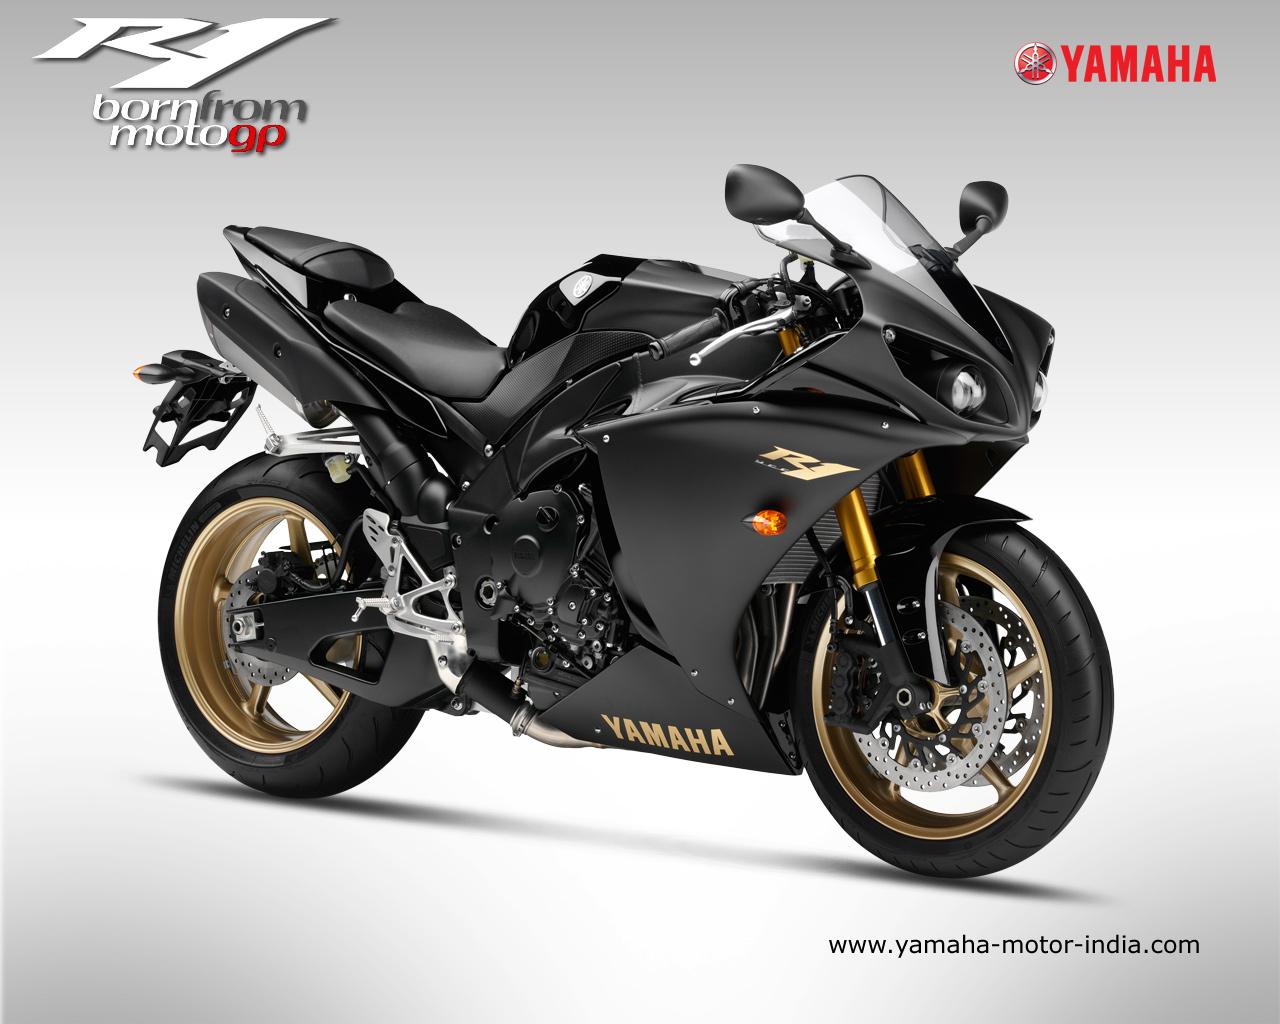 Market Price: Yamaha YZF-R1